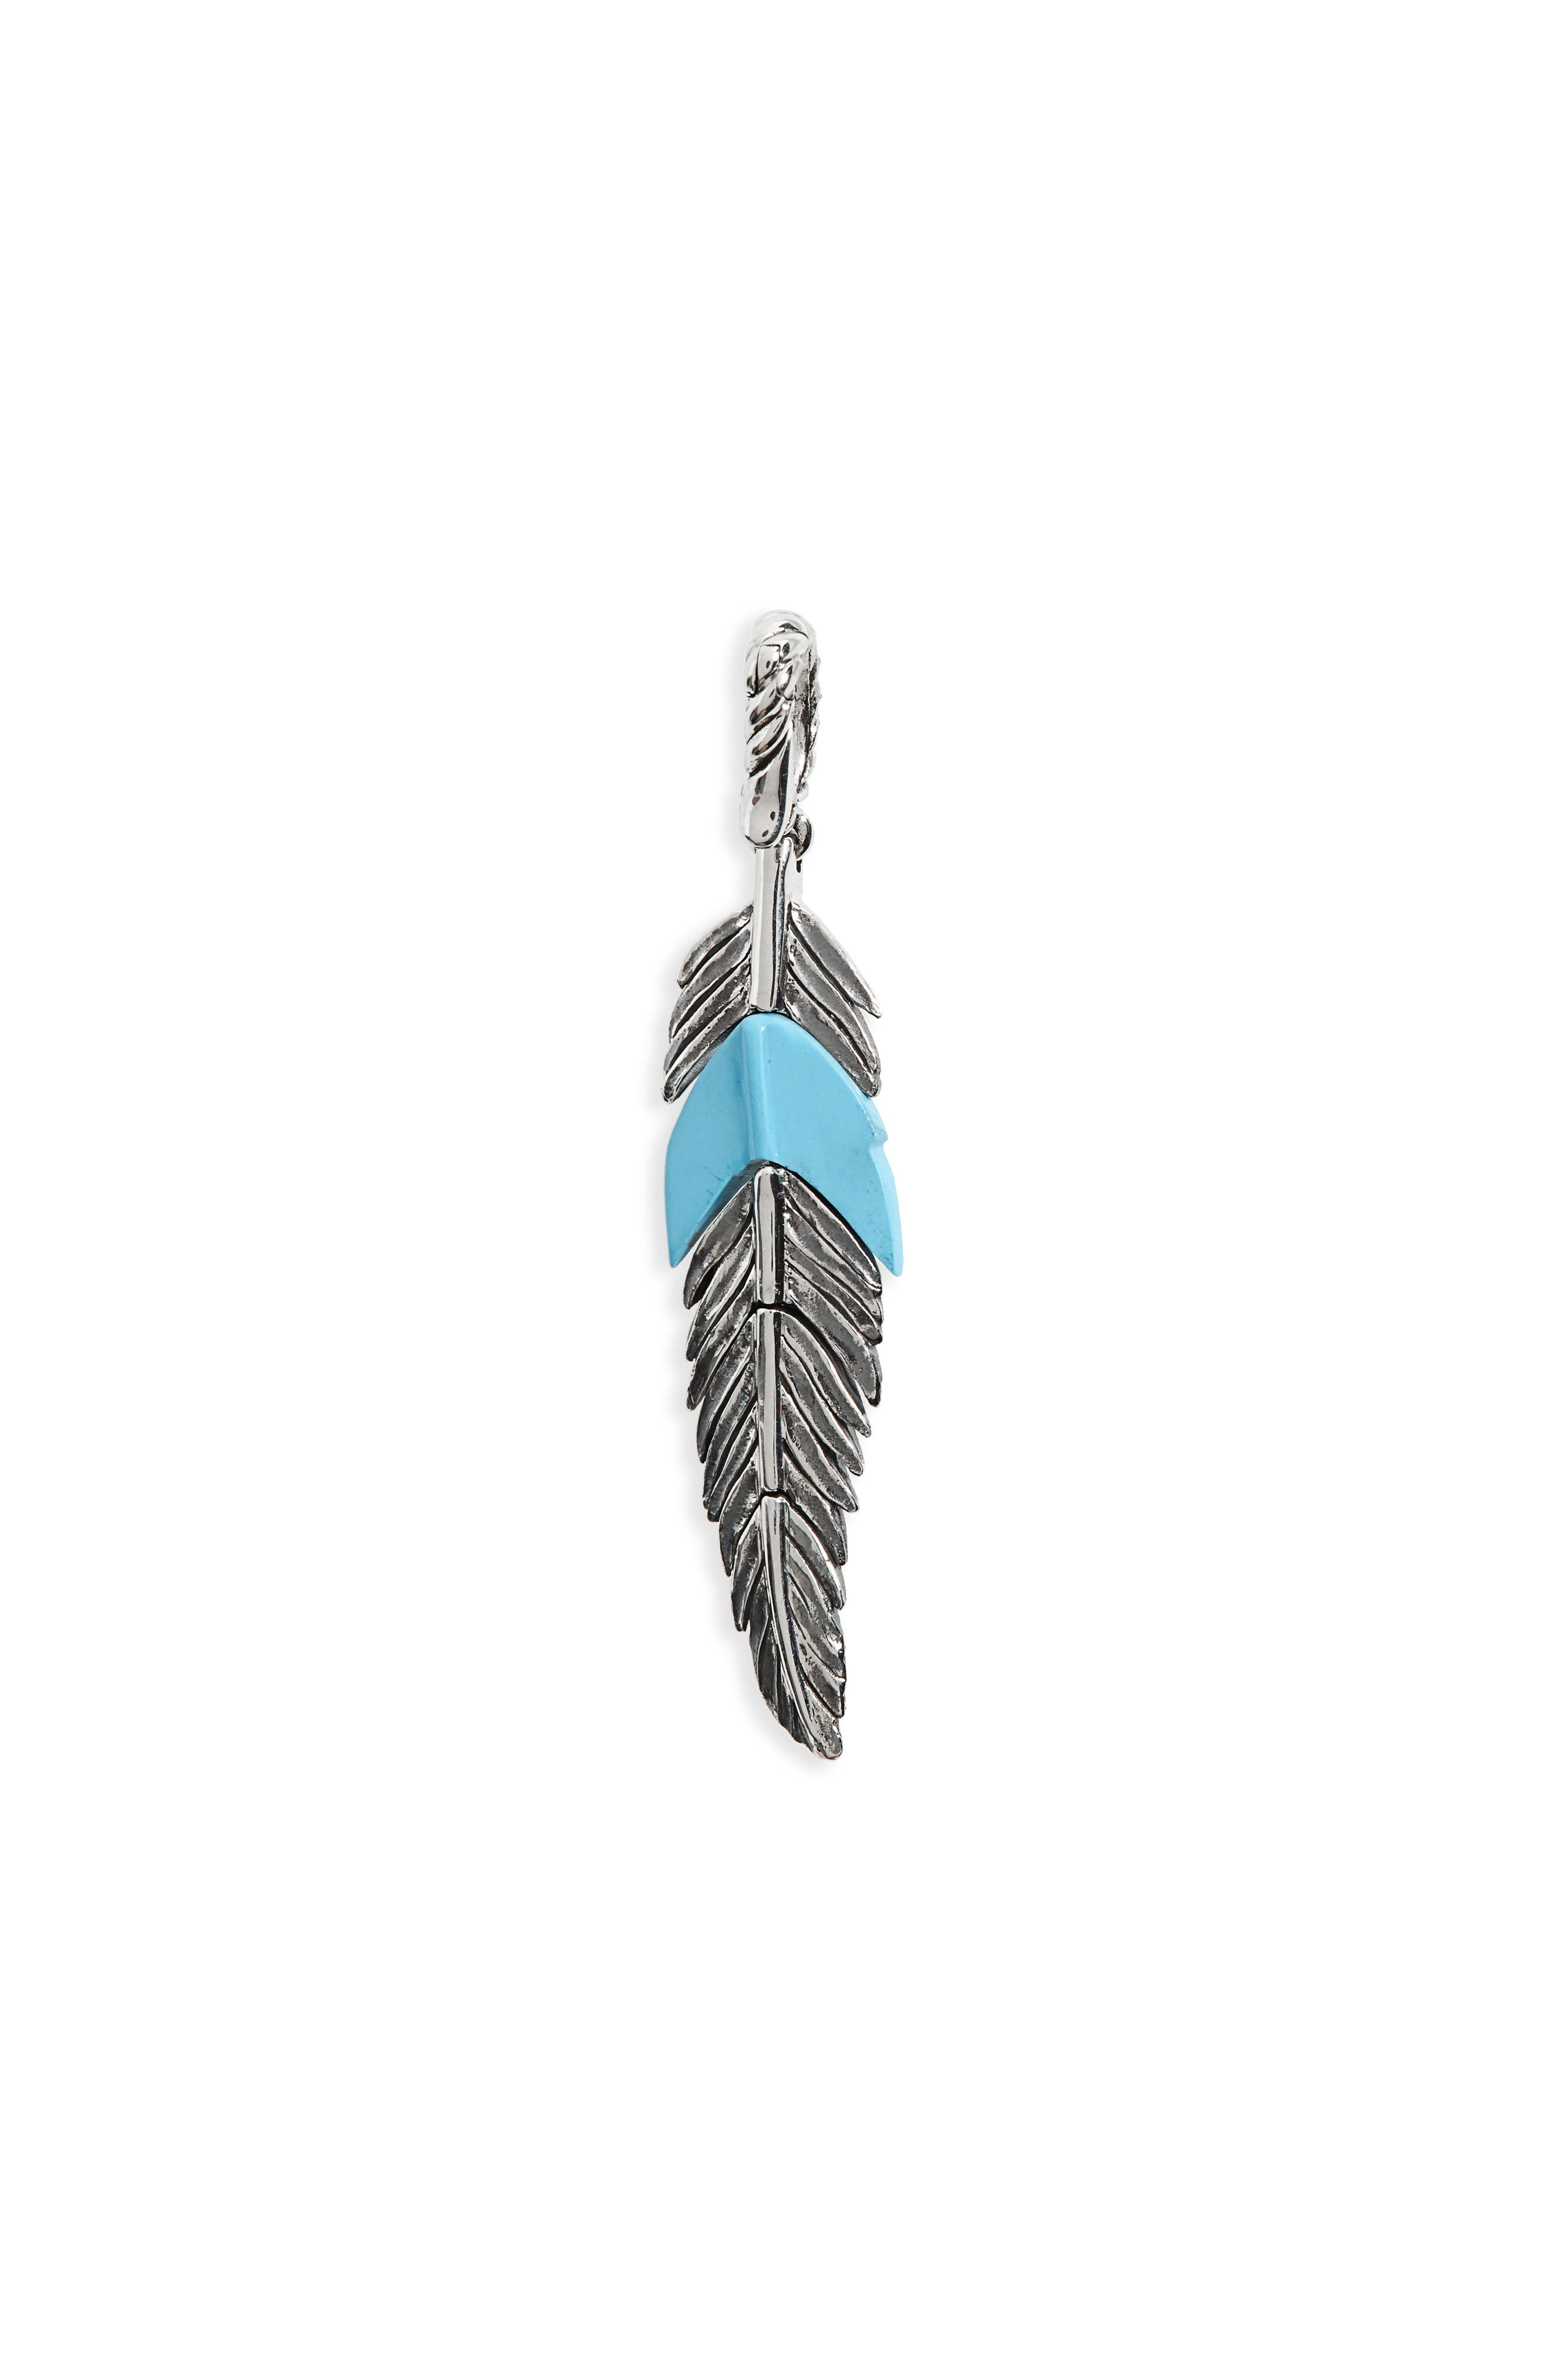 Alternate Image 1 Selected - David Yurman Feather Amulet with Turquoise